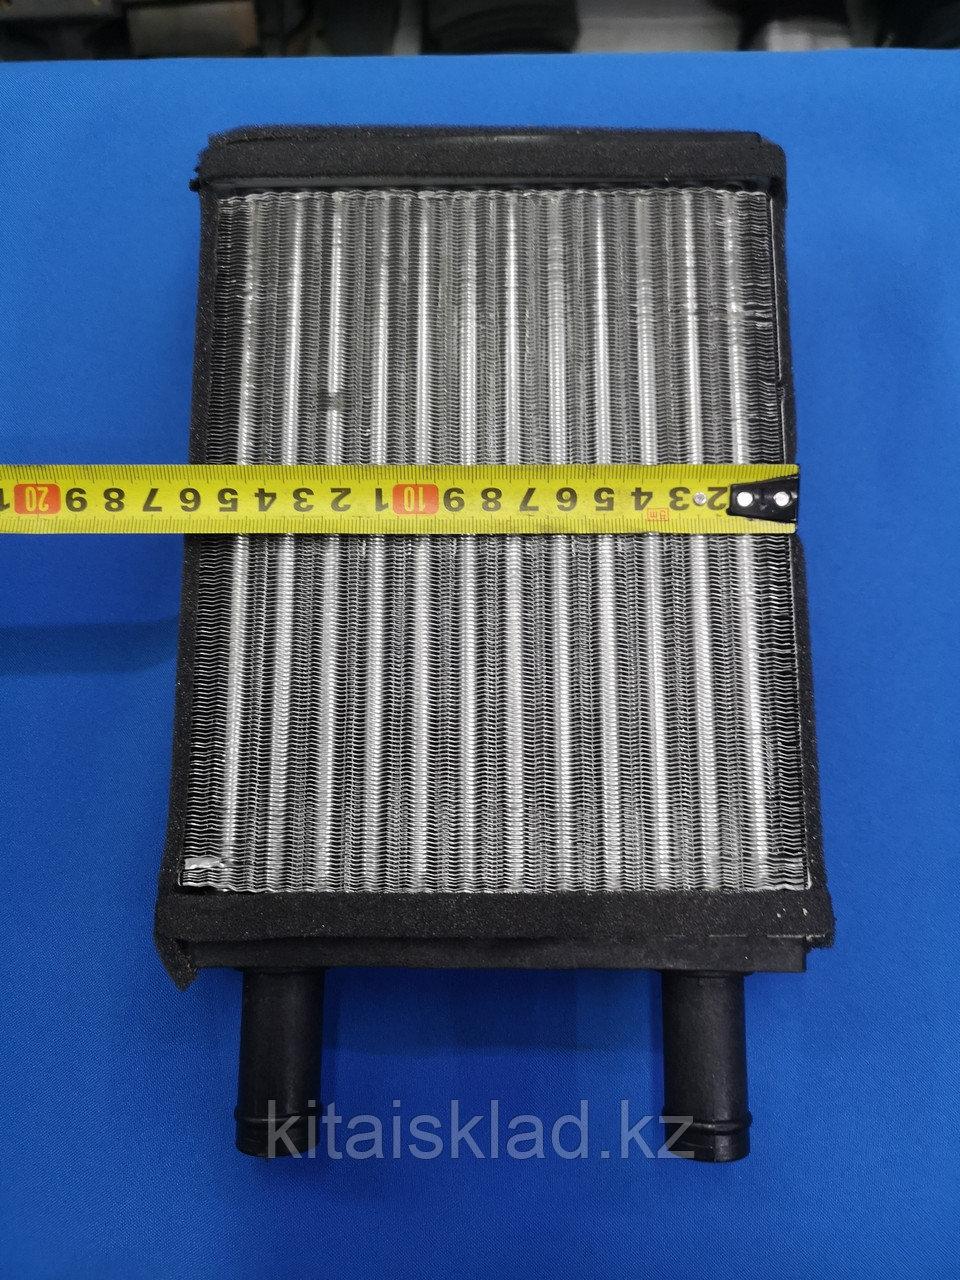 Радиатор печки кран QY25 XCMG